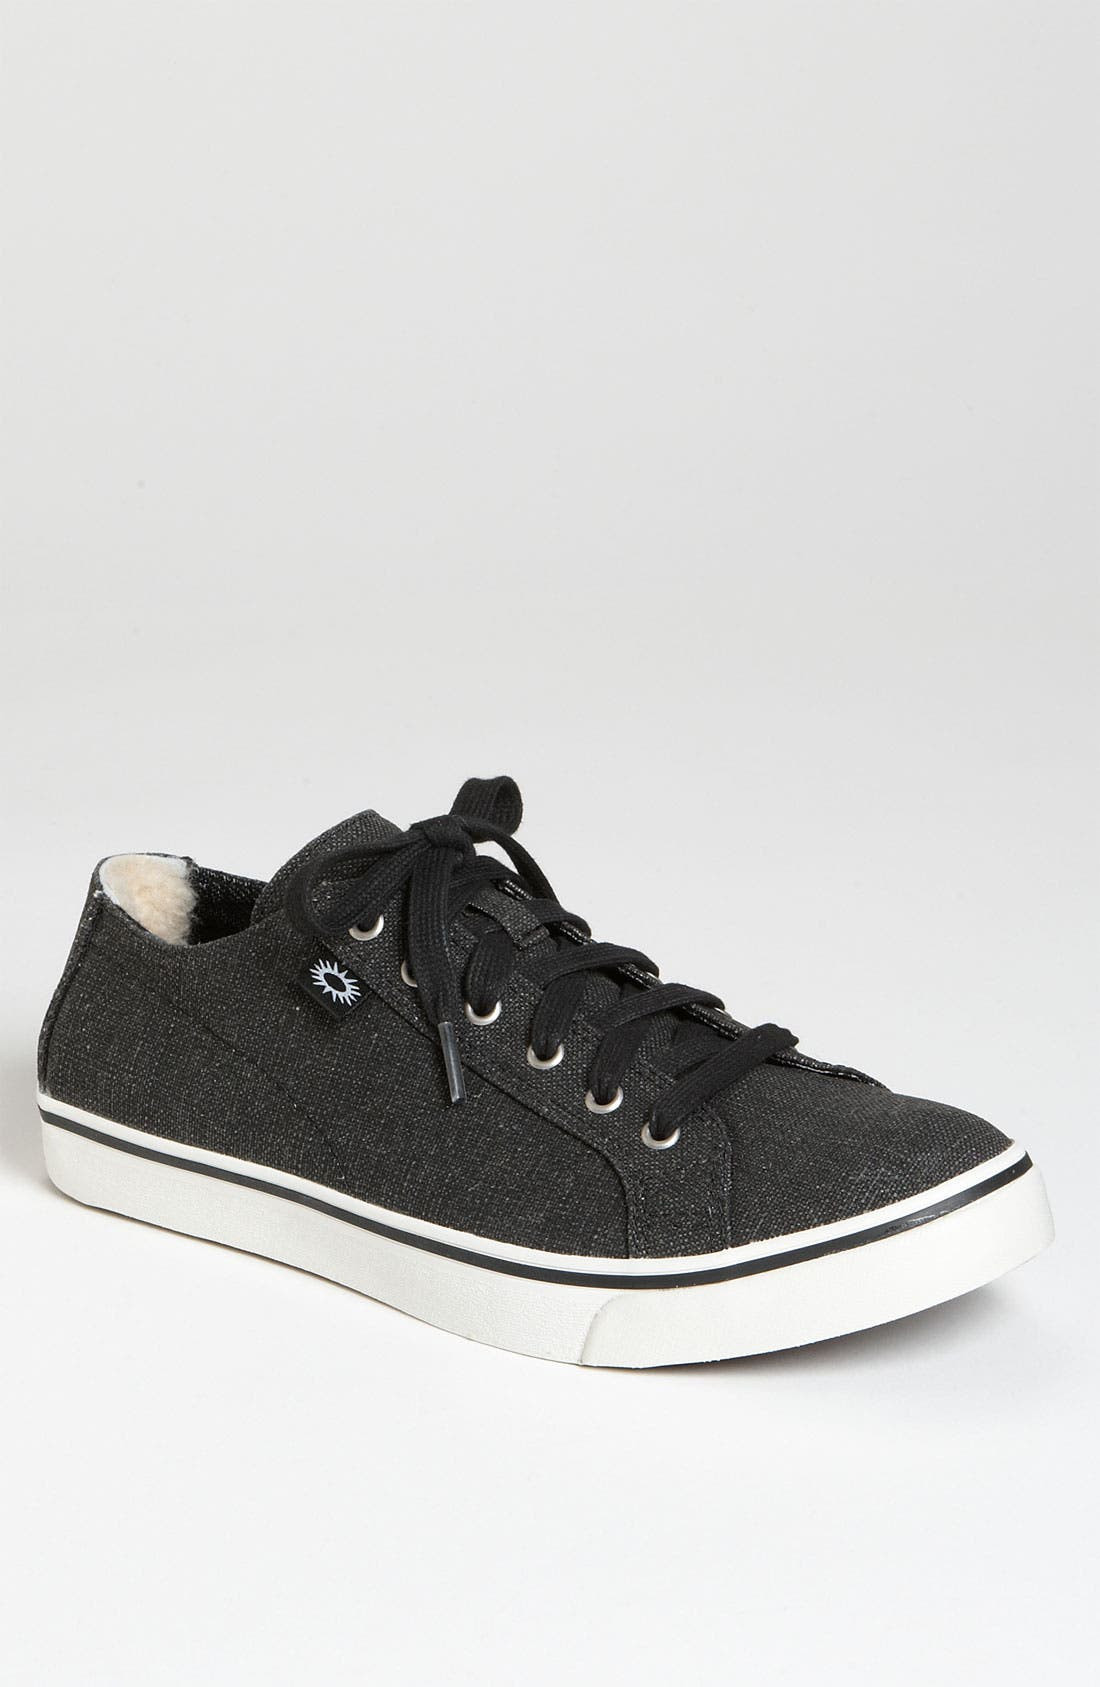 Alternate Image 1 Selected - UGG® Australia 'Vanowen' Canvas Sneaker (Men)